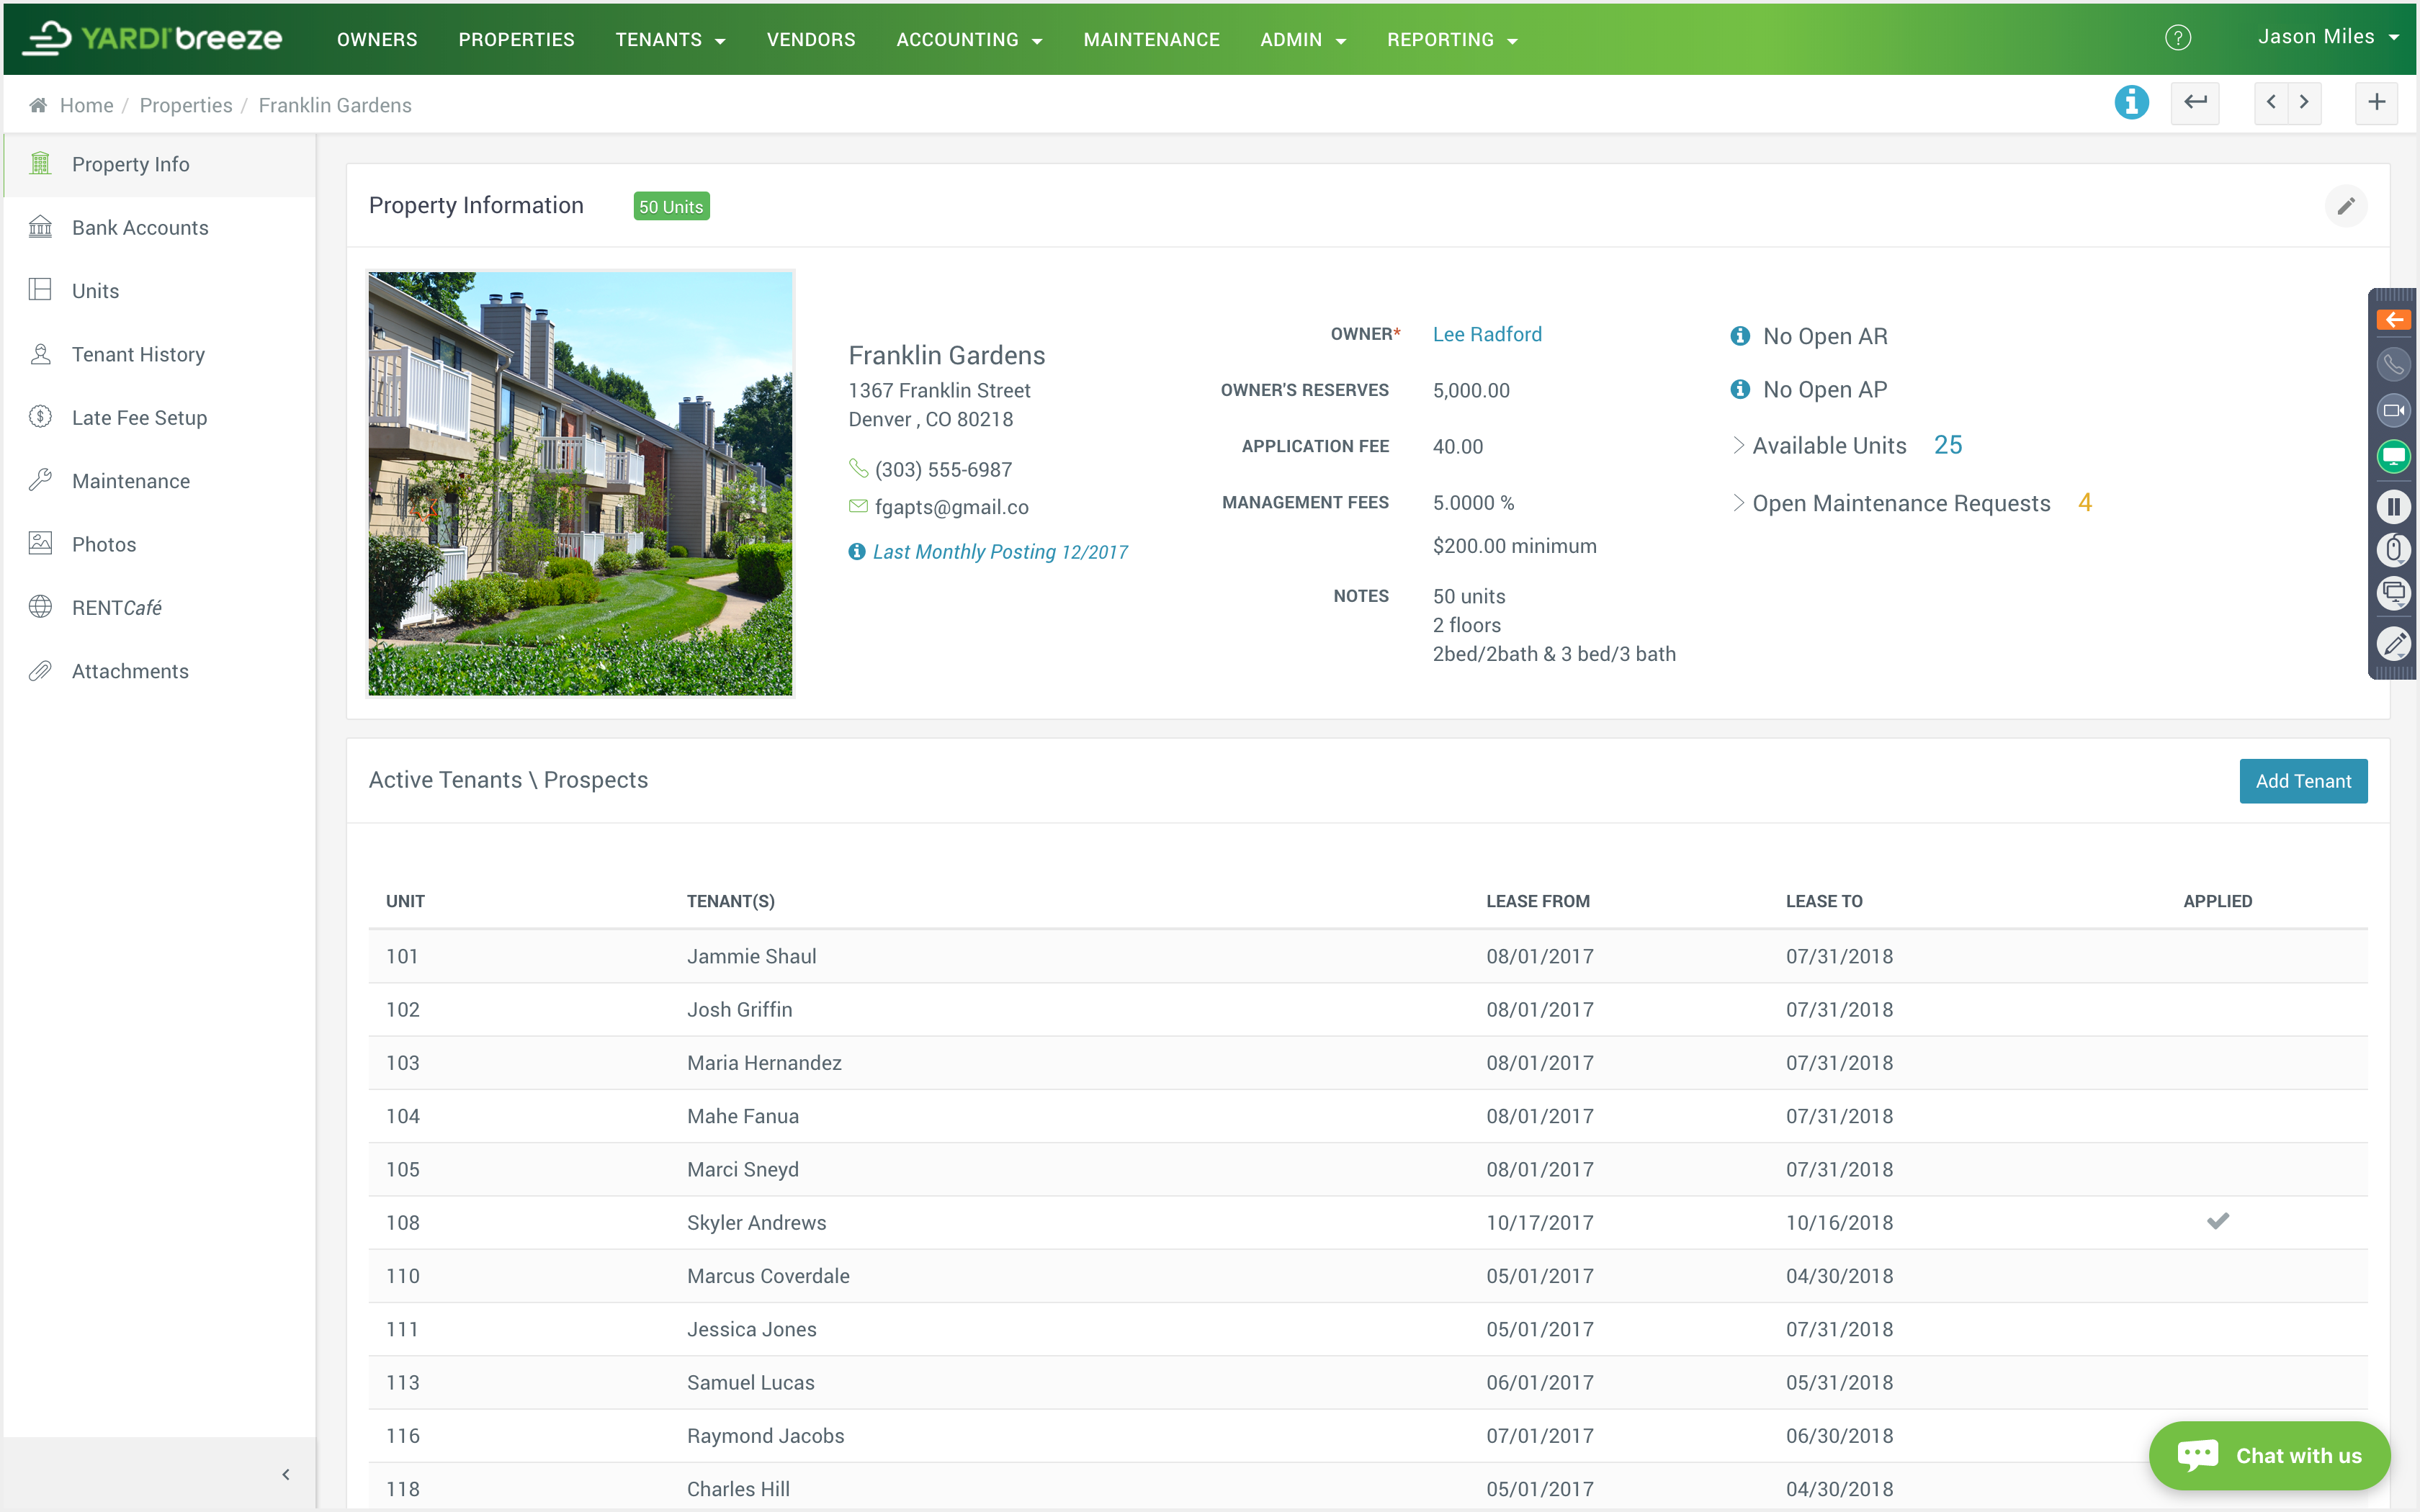 Property information